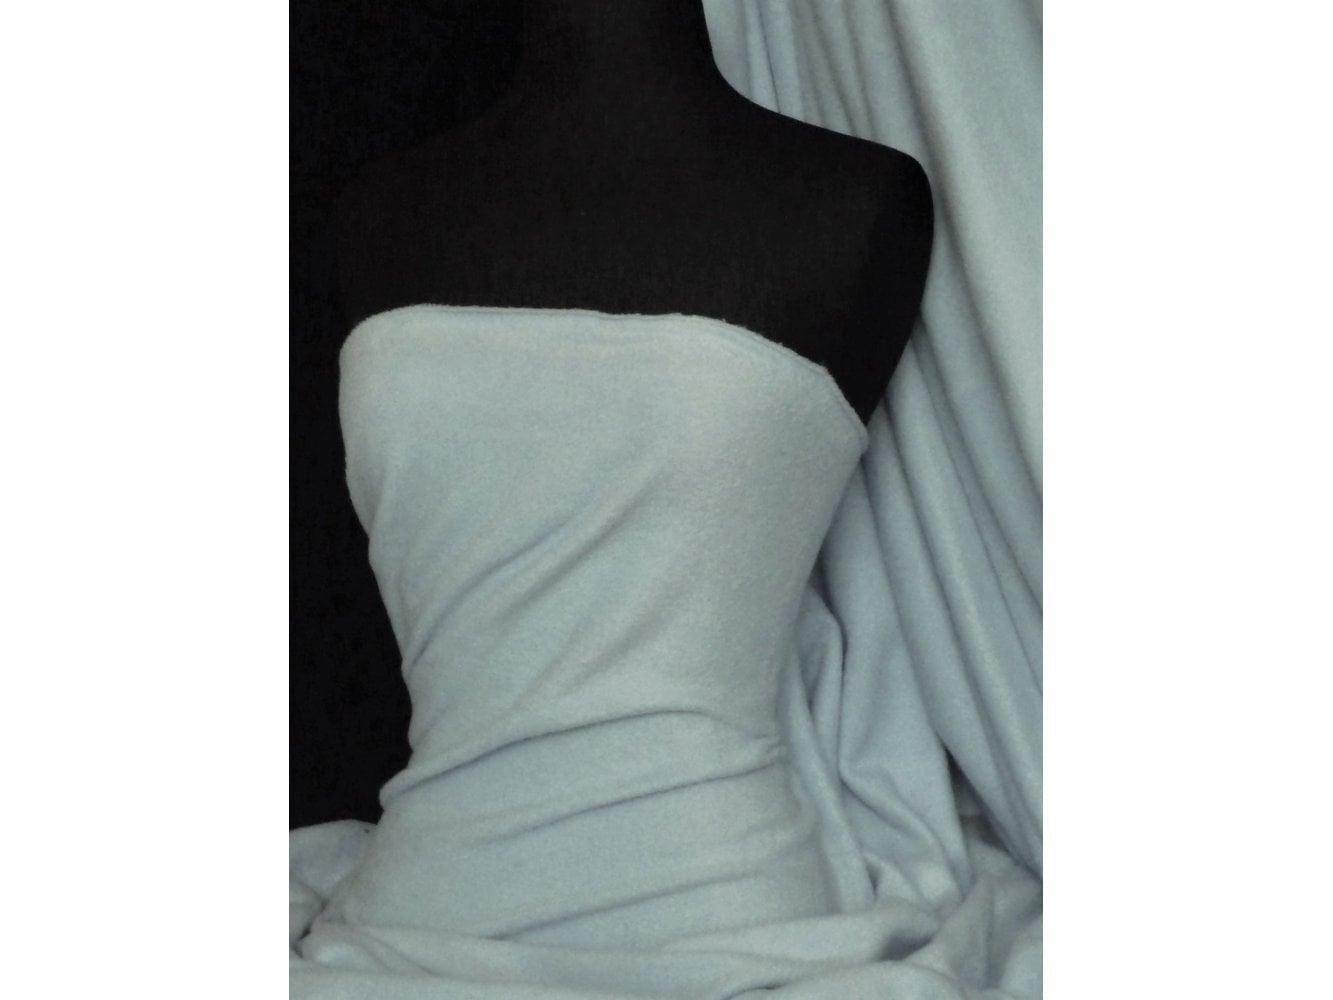 Red Polar Fleece - Anti Pill Washable Soft Fabric PF_RD